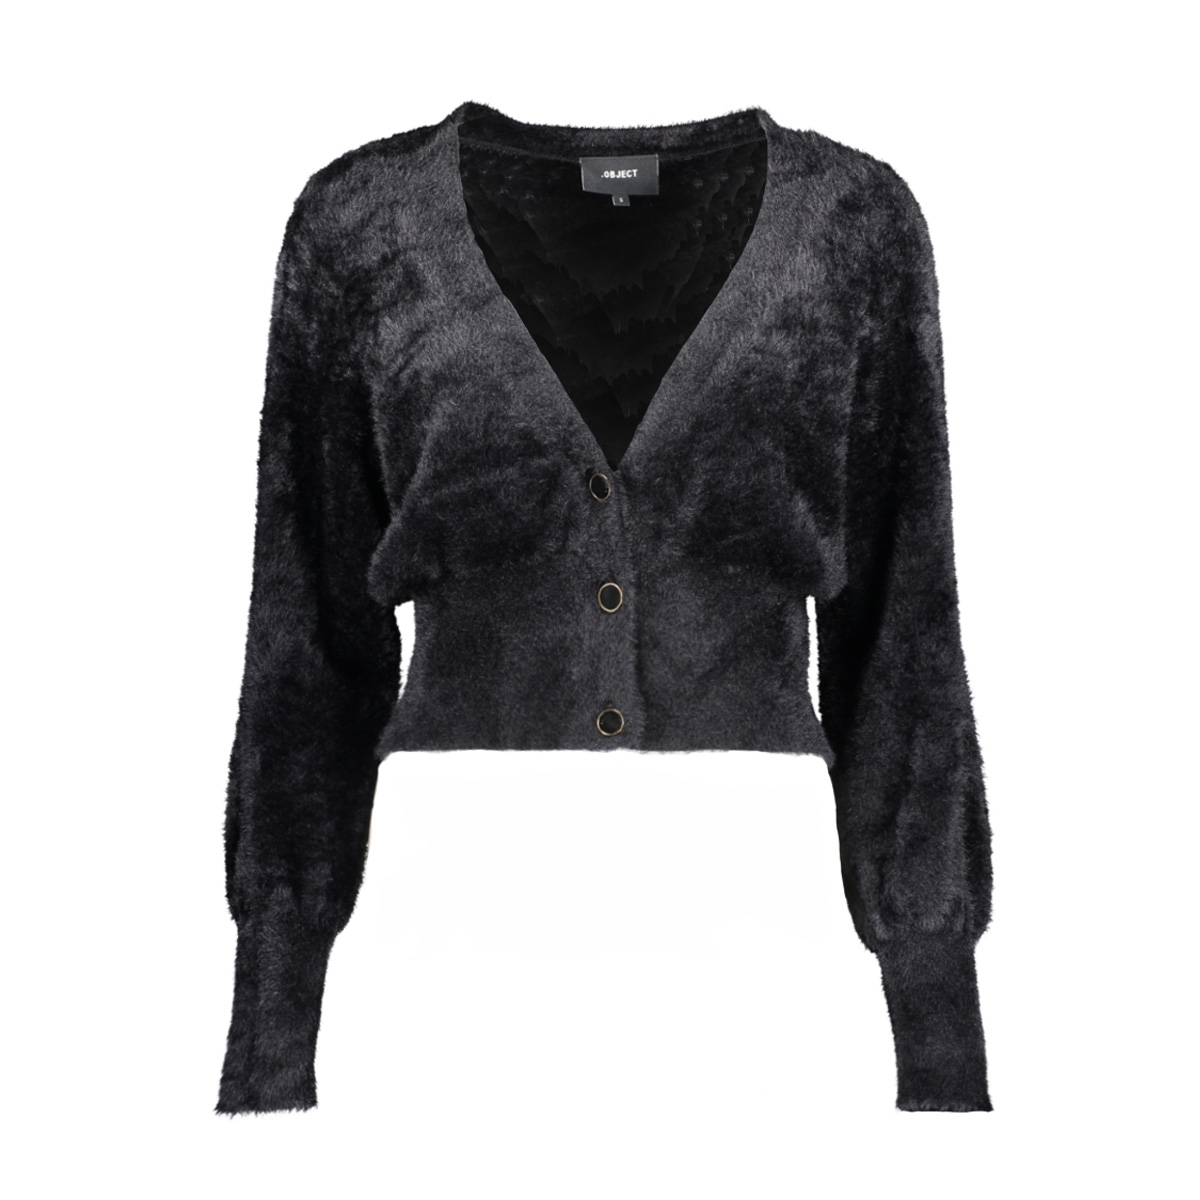 objcasra l/s knit short cardigan 10 23031111 object vest black